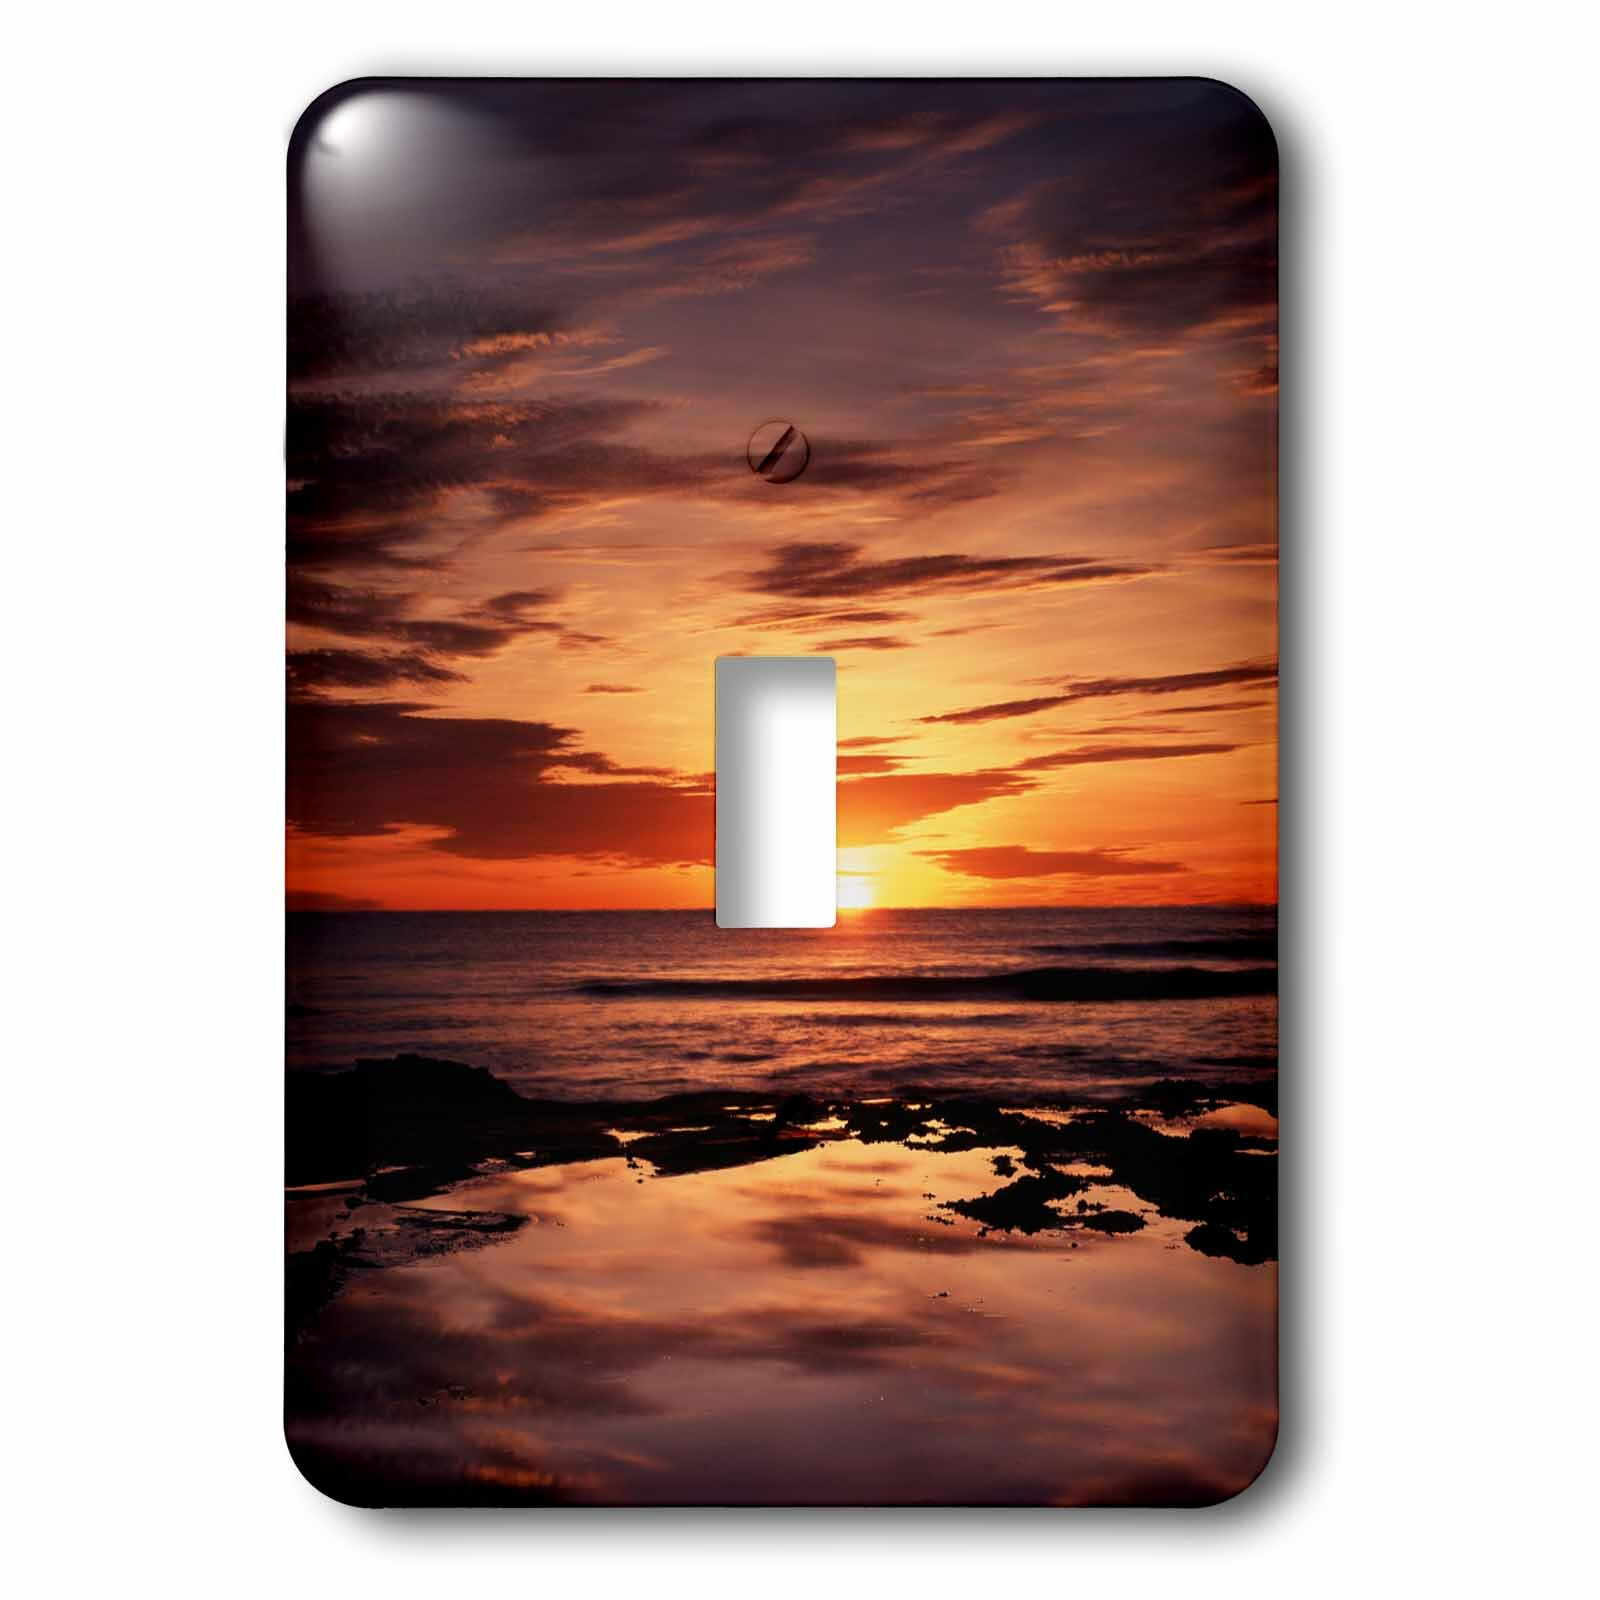 3drose California San Diego Sunset 1 Gang Toggle Light Switch Wall Plate Wayfair